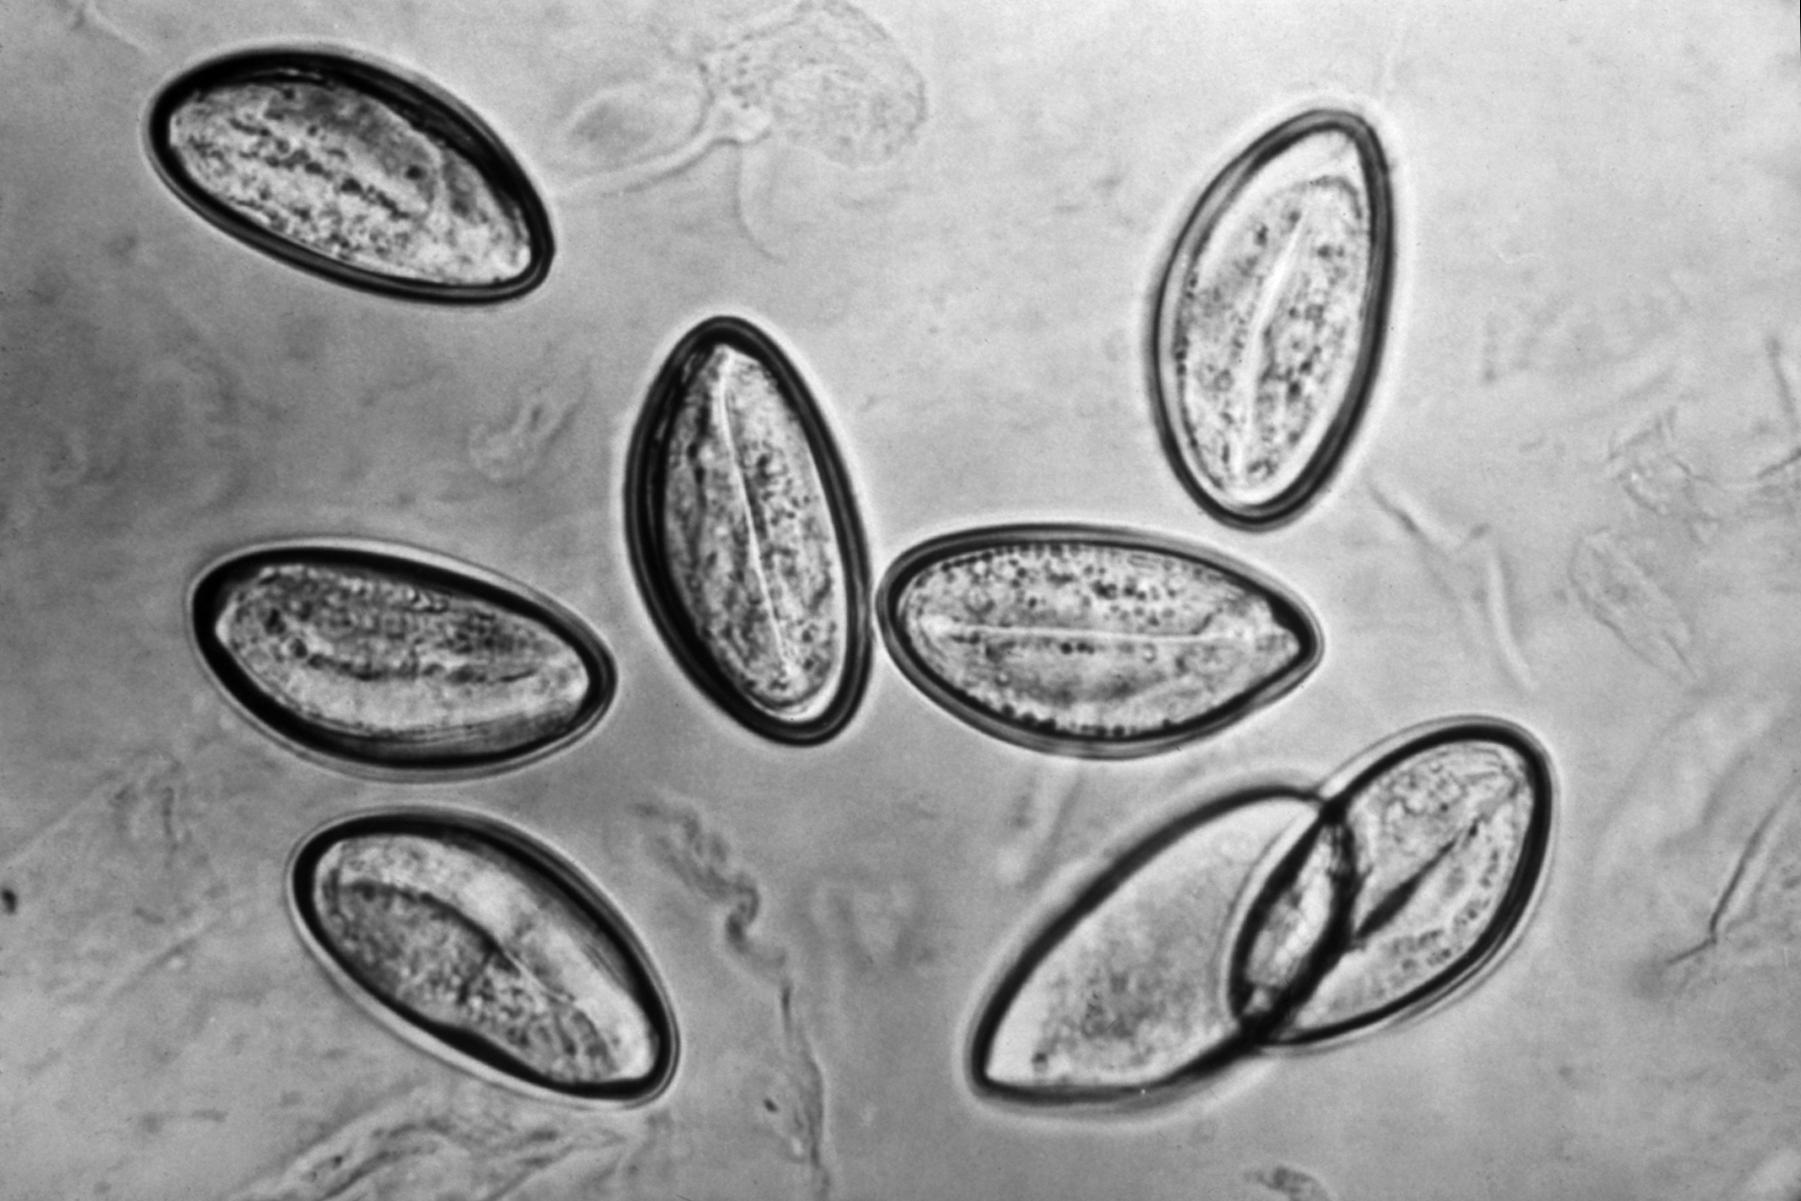 Oxiuroza (oxiuri) Enterobius vermicularis = oxyuris vermicularis